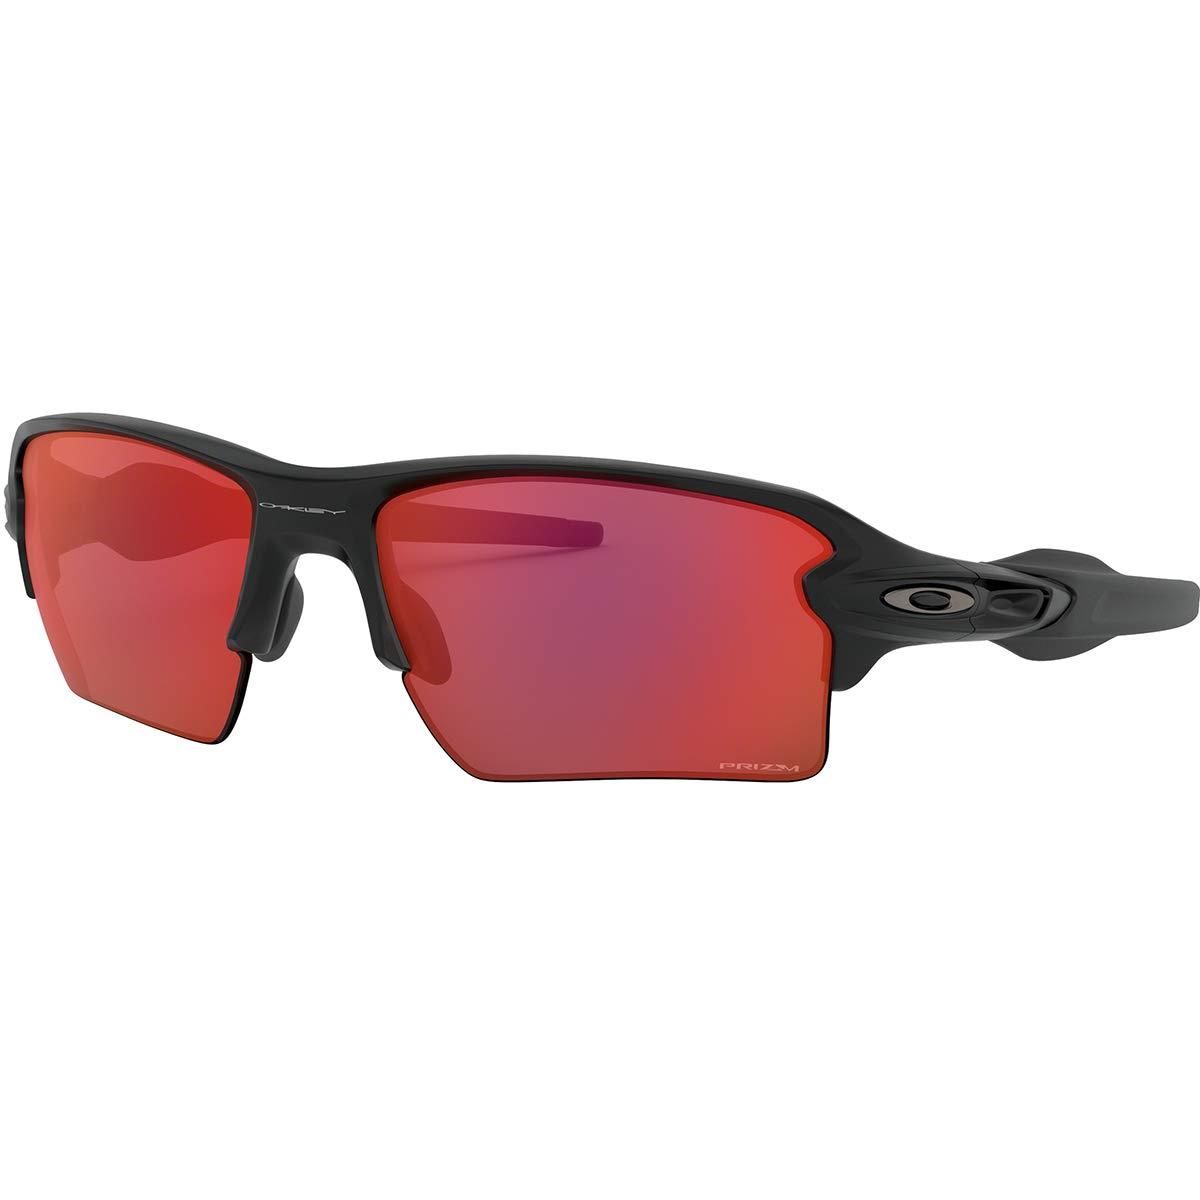 Oakley Flak 2.0 XL Sunglasses,OS,Matte Black/Prizm Trail Torch